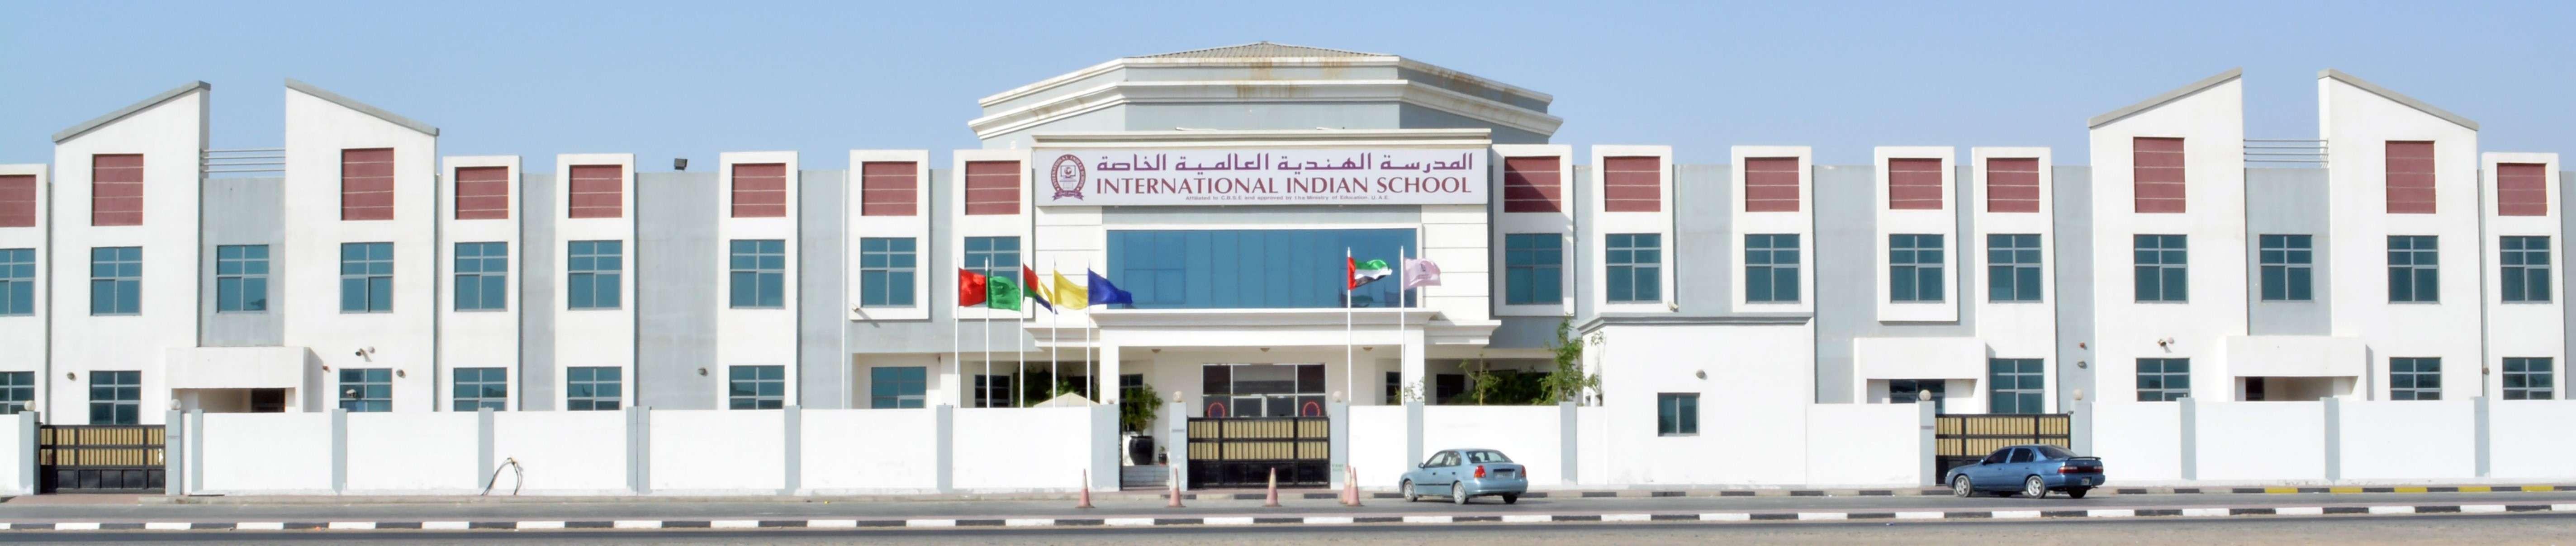 INTERNATIONAL INDIAN SCHOOL JPOST BOX 5665 AJMAN UAE 6630052